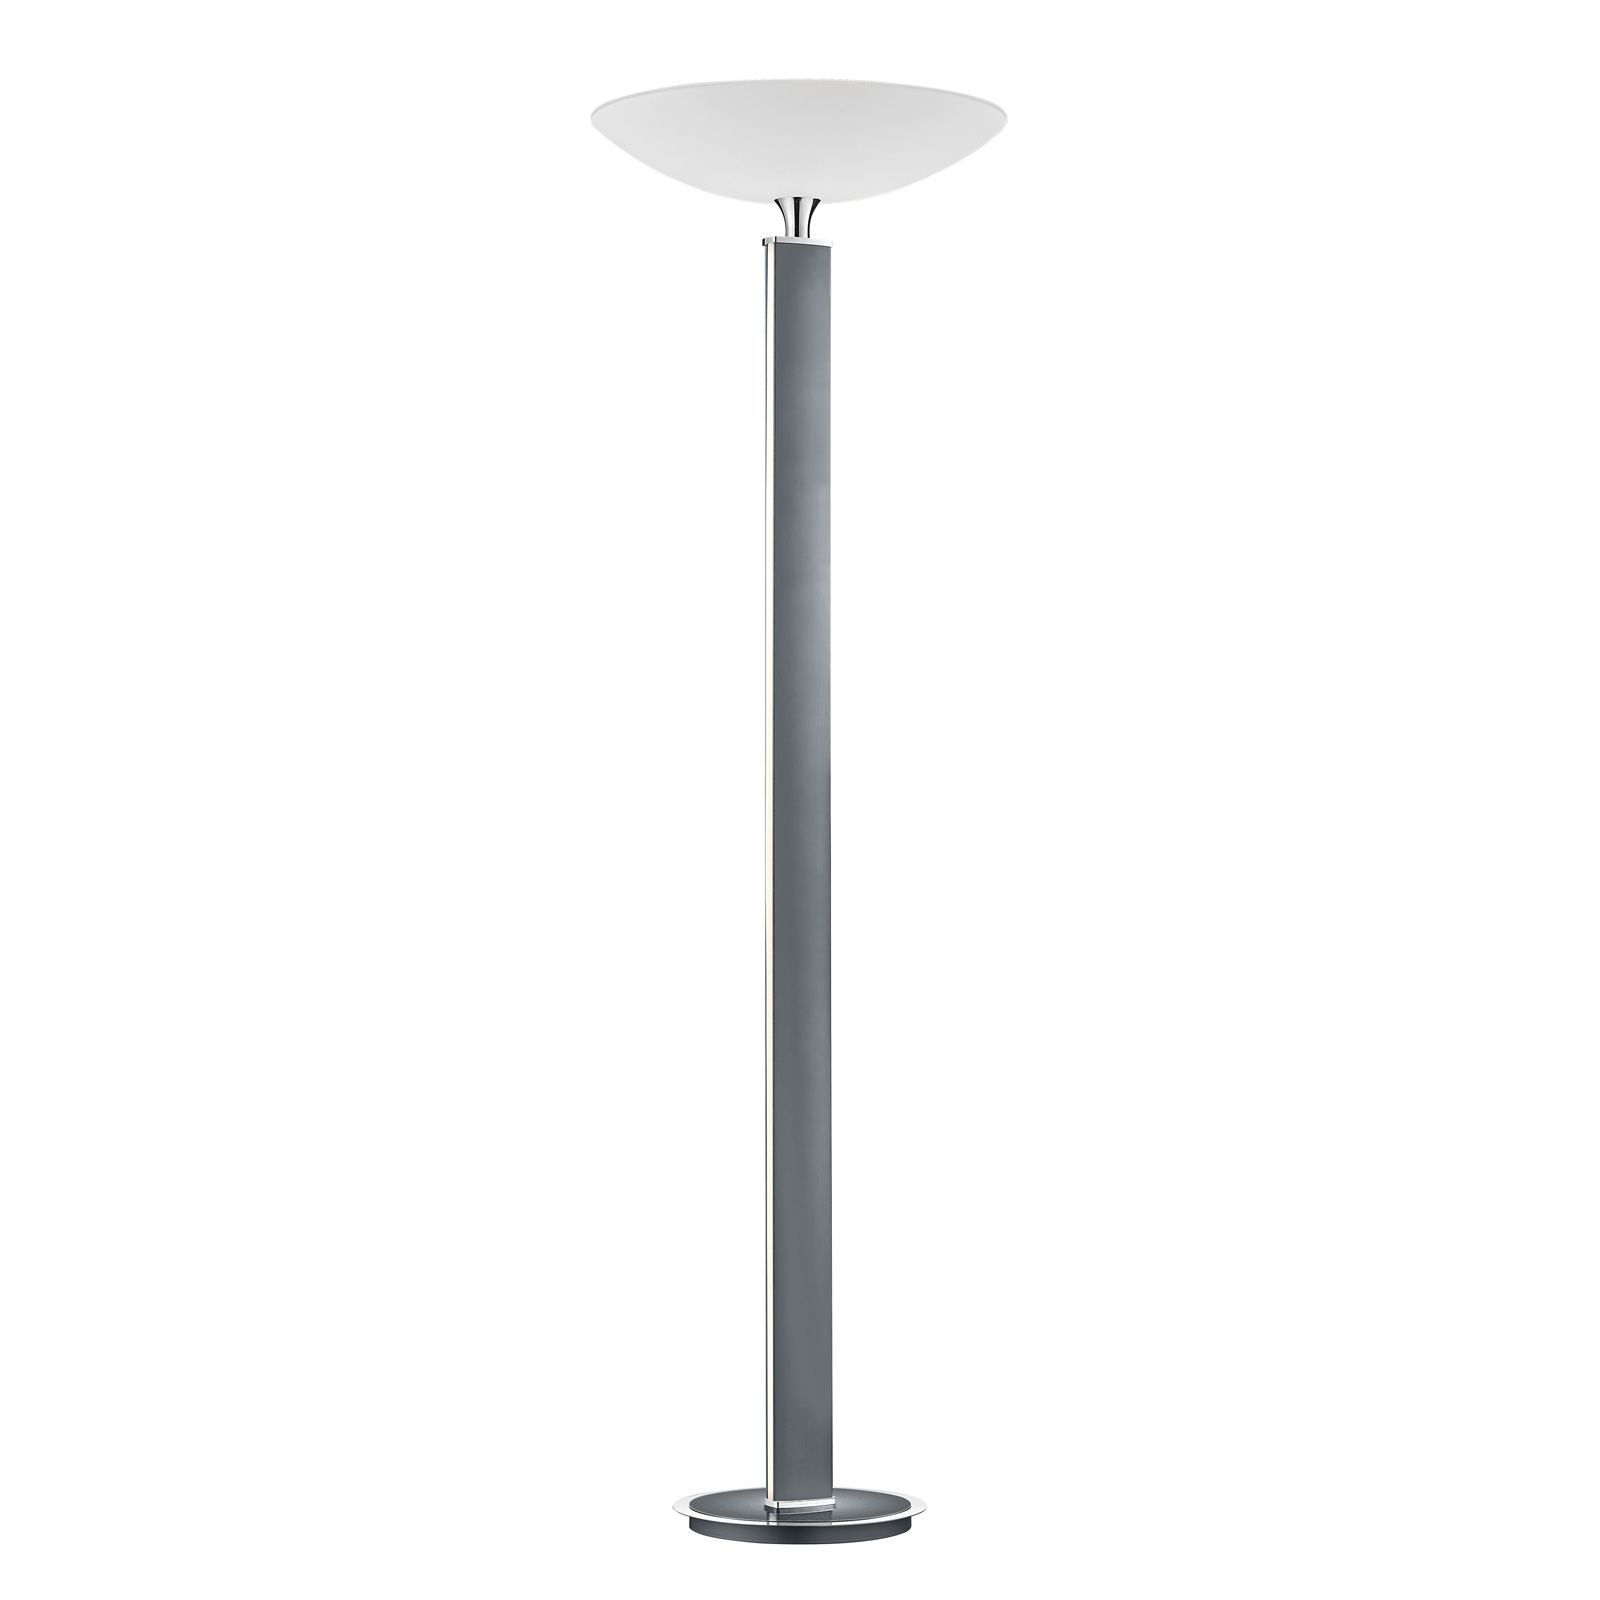 BANKAMP Pure F LED-uplight-golvlampa, antracit